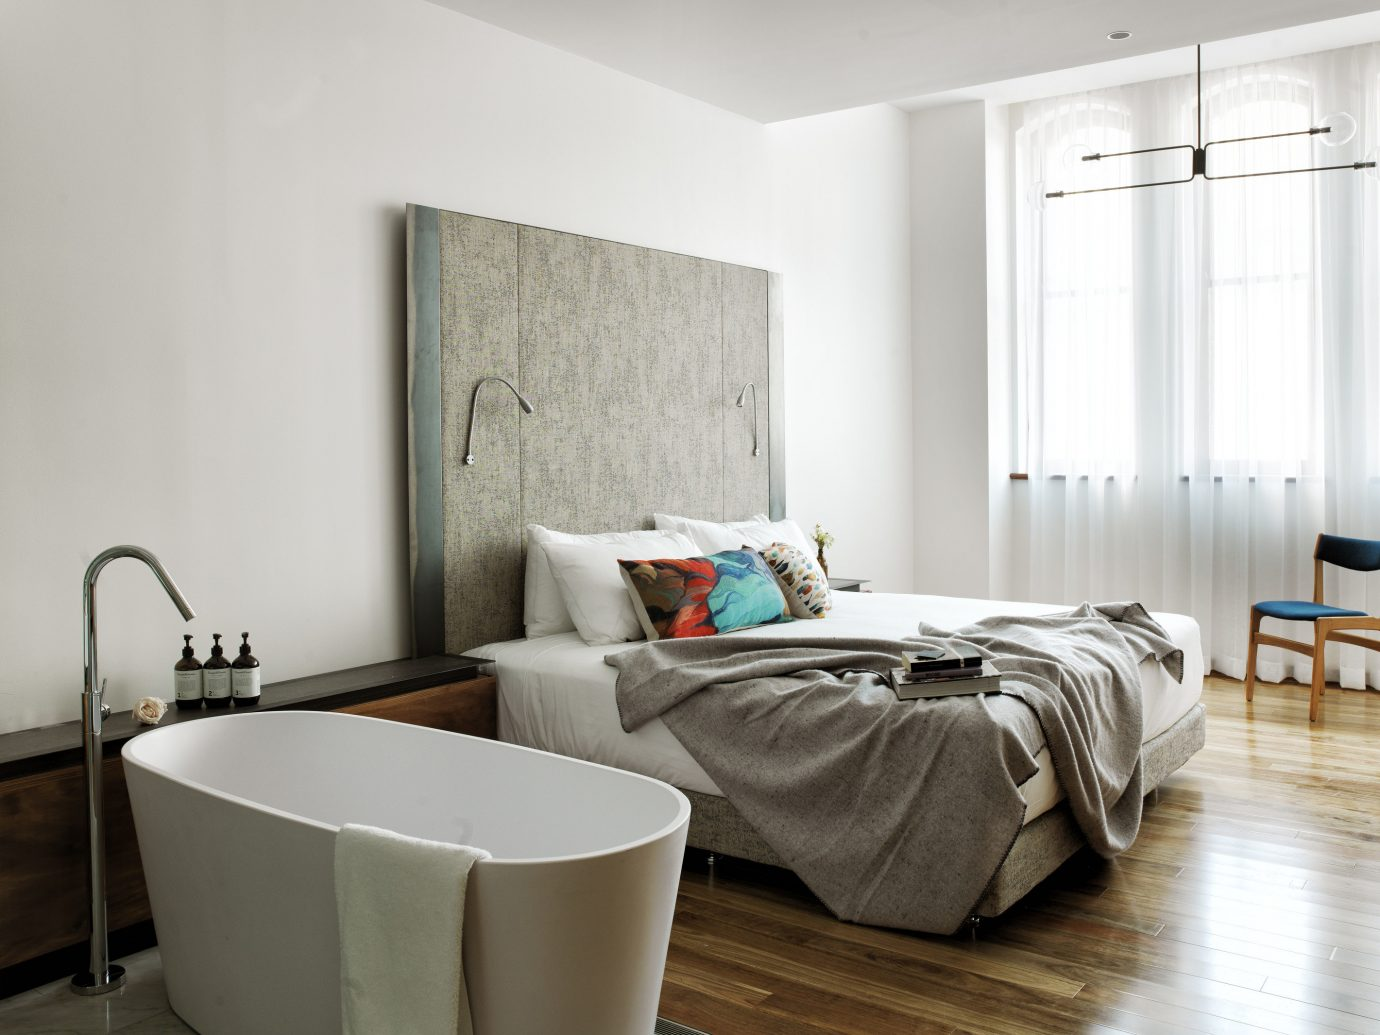 Trip Ideas indoor wall floor room property interior design living room home real estate Design Suite apartment Bedroom